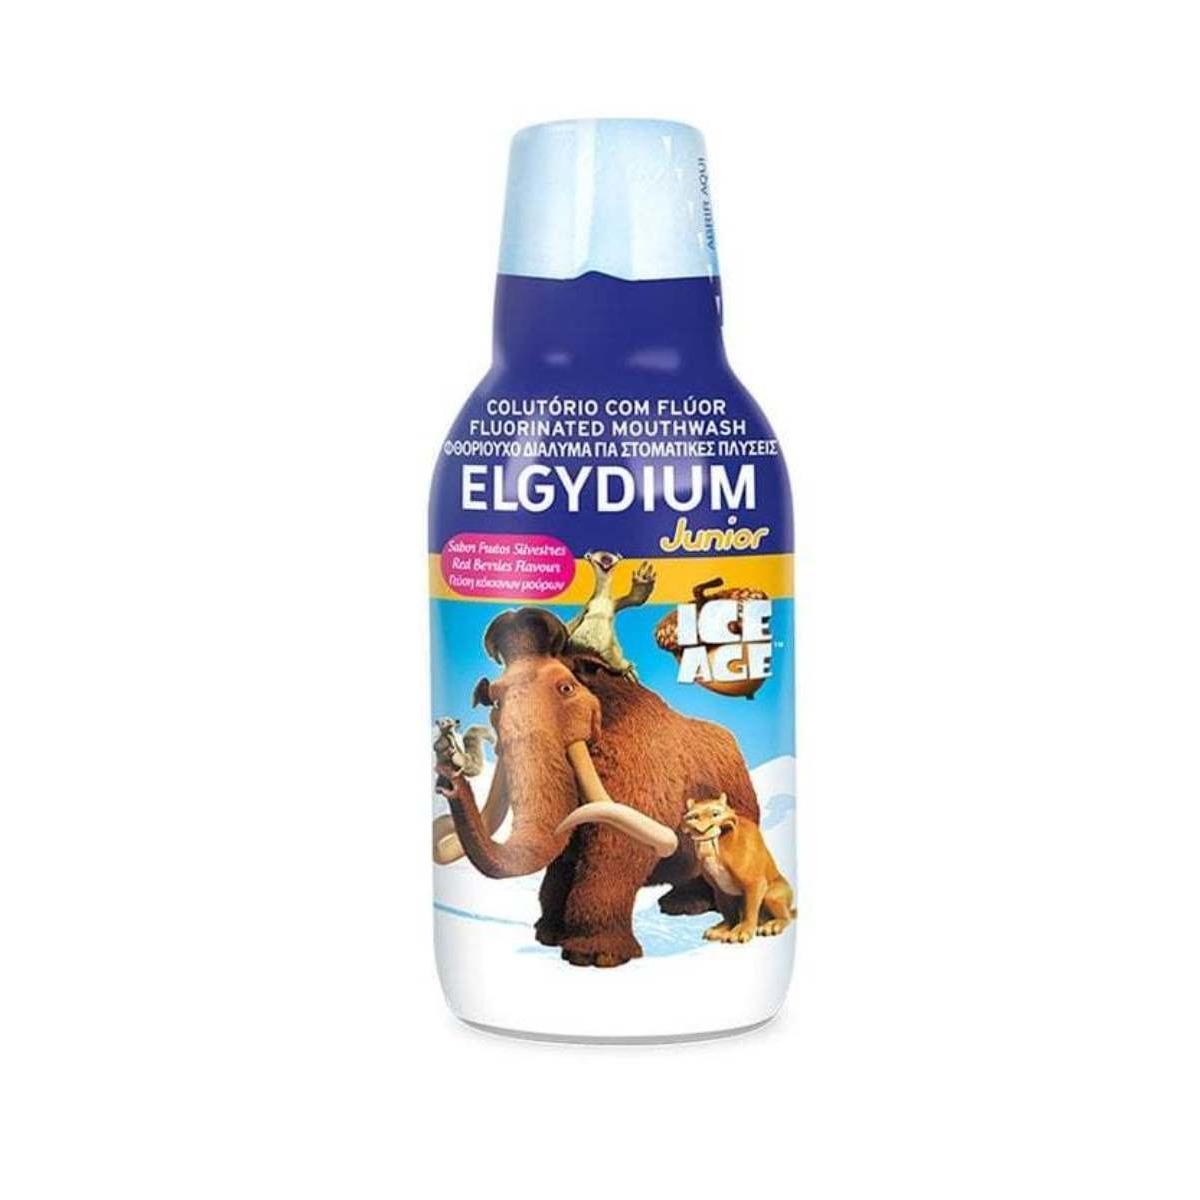 Elgydium Júnior Colutório Flúor Idade Gelo 500ml